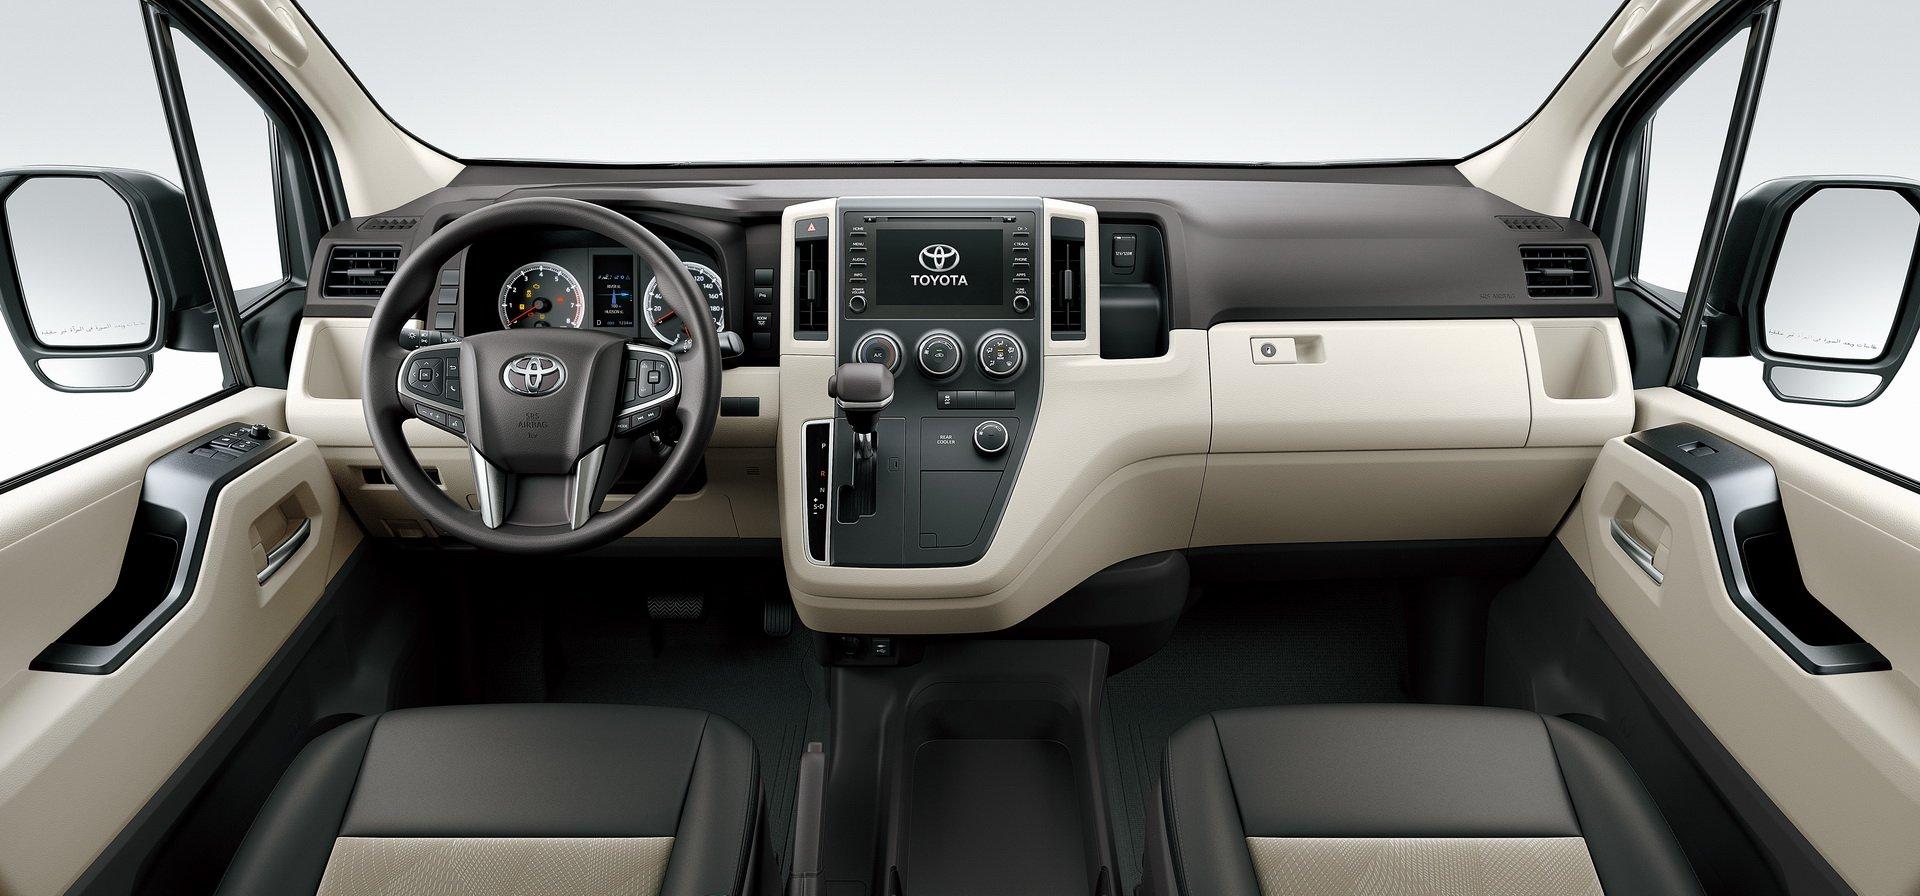 Toyota Hiace 2019 (10)